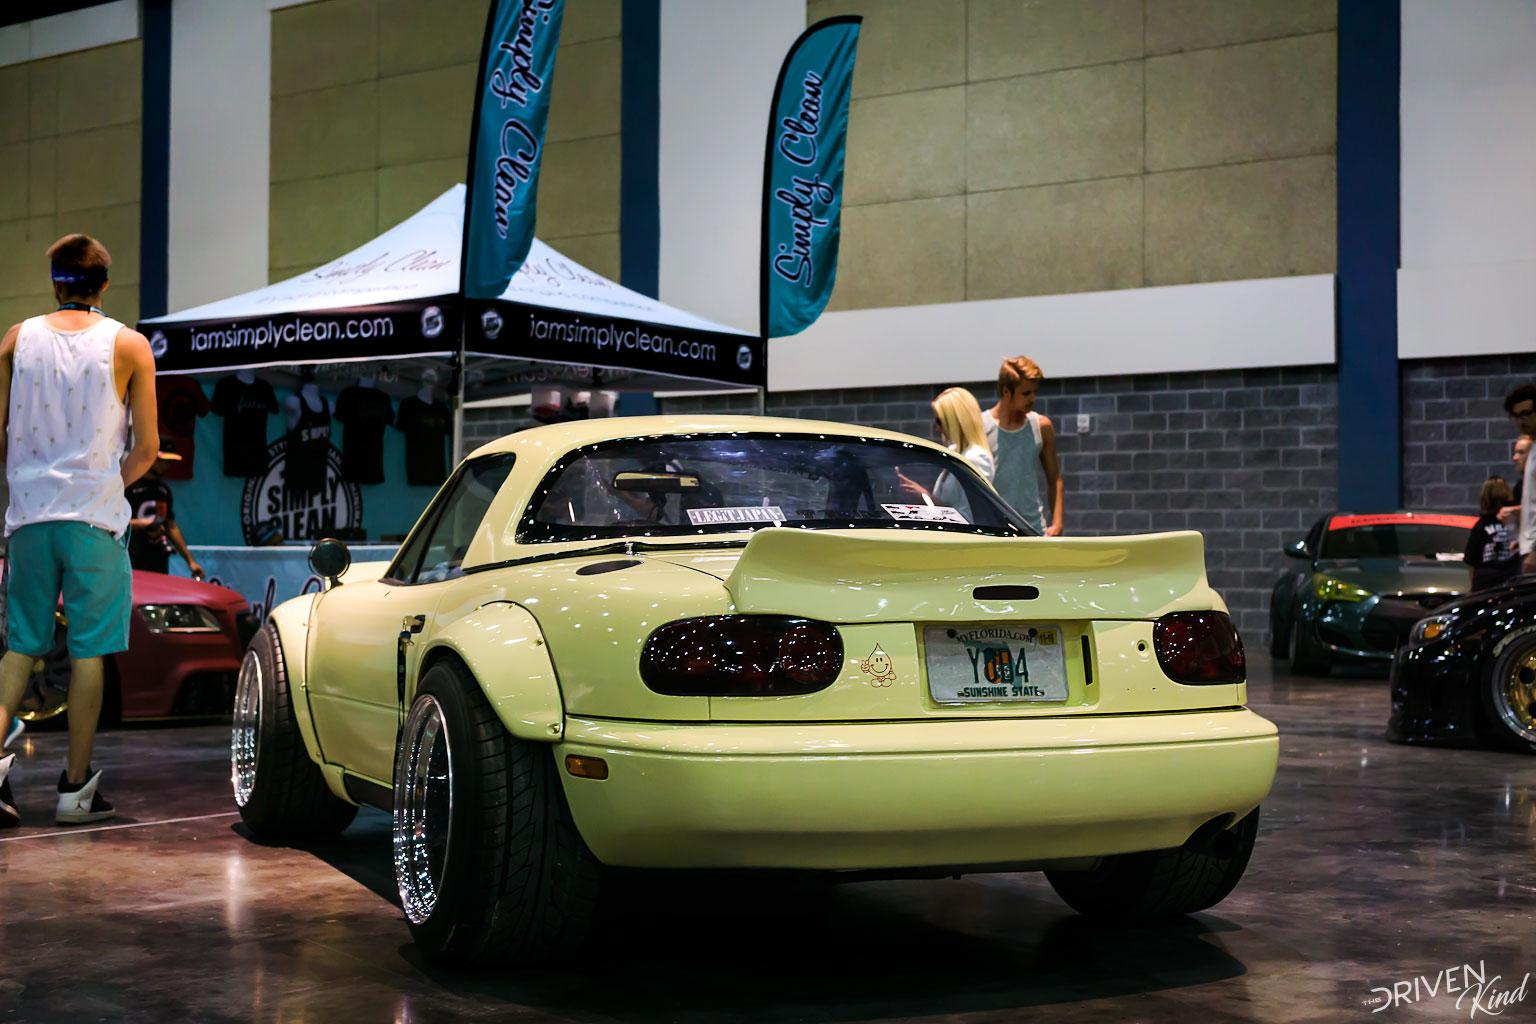 Mazda Miata widebody STANCENATION FLORIDA PALM BEACH CONVENTION CENTER 2017 Pt. 2 The Driven Kind Coverage